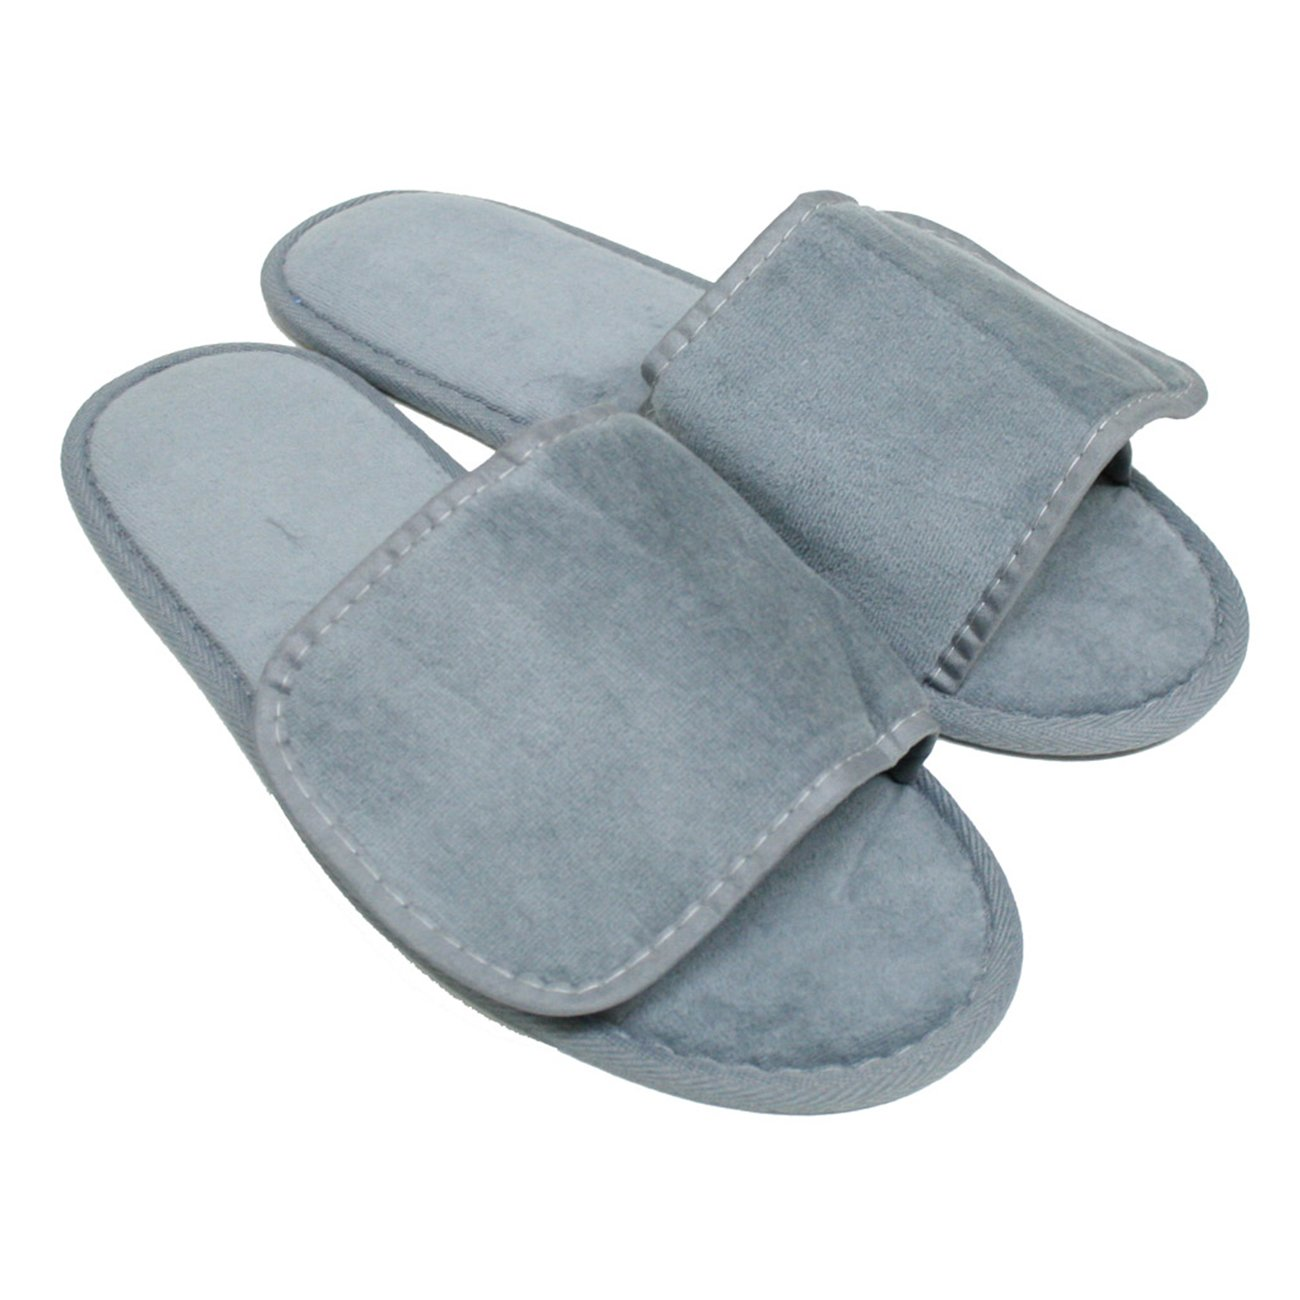 Terry Nylon Fabric Closure Open Toe Unisex Slippers Wholesale 100 Pcs (One Size 11'', Cool Grey)